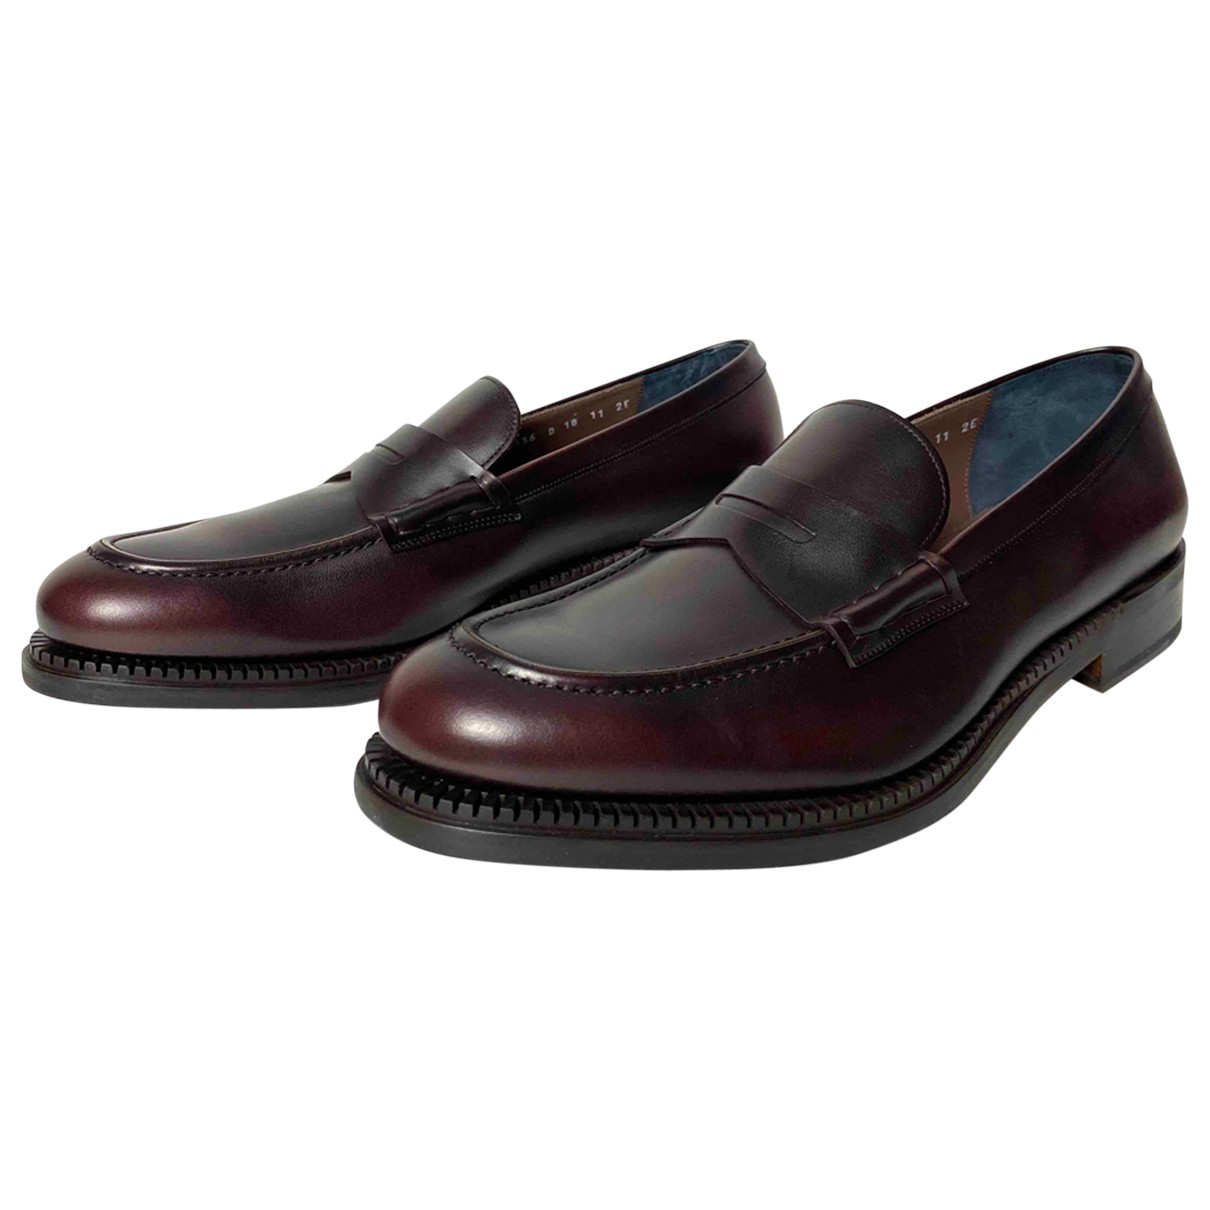 Salvatore Ferragamo N Burgundy Leather Flats for Men 11 UK